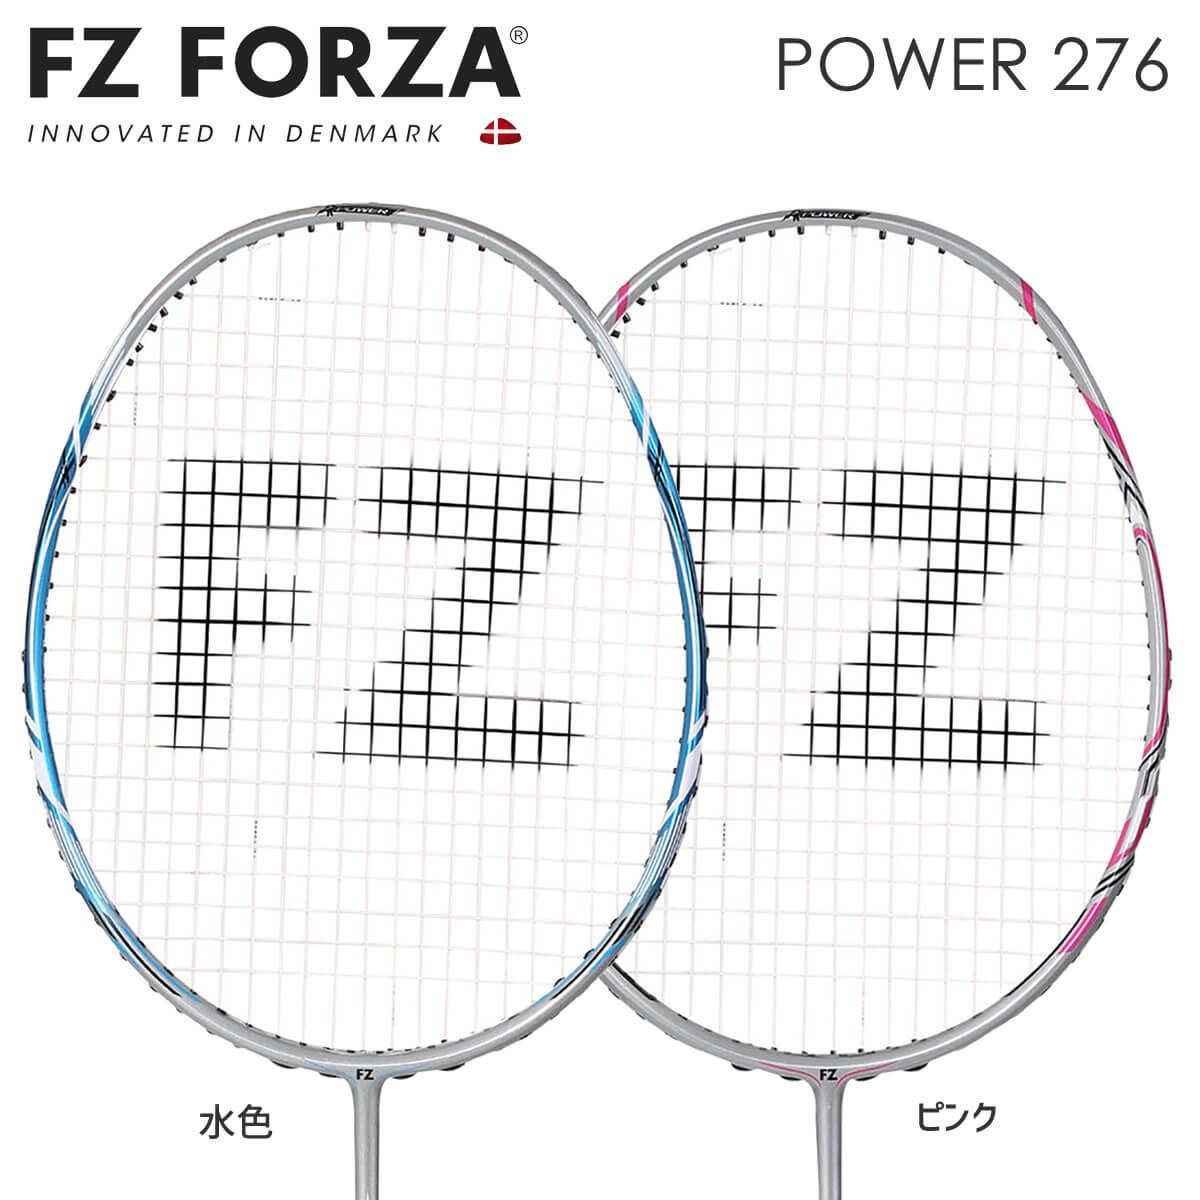 FZ FORZA POWER 276(P276) バドミントンラケット フォーザ【日本バドミントン協会審査合格品/オススメガット&ガット張り工賃無料】